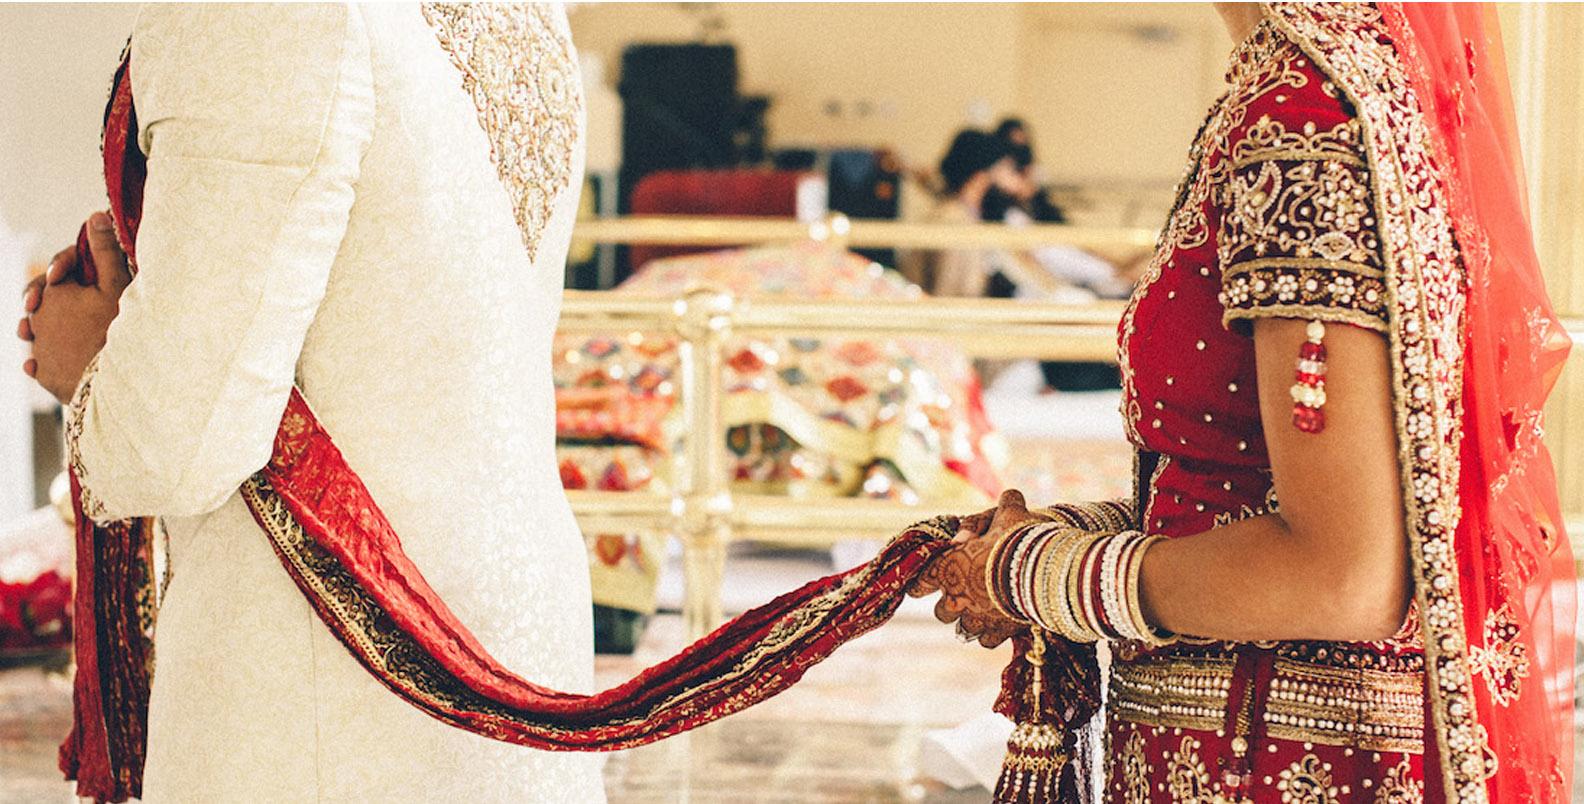 Divorced indian dating usa - PILOT Automotive Labs